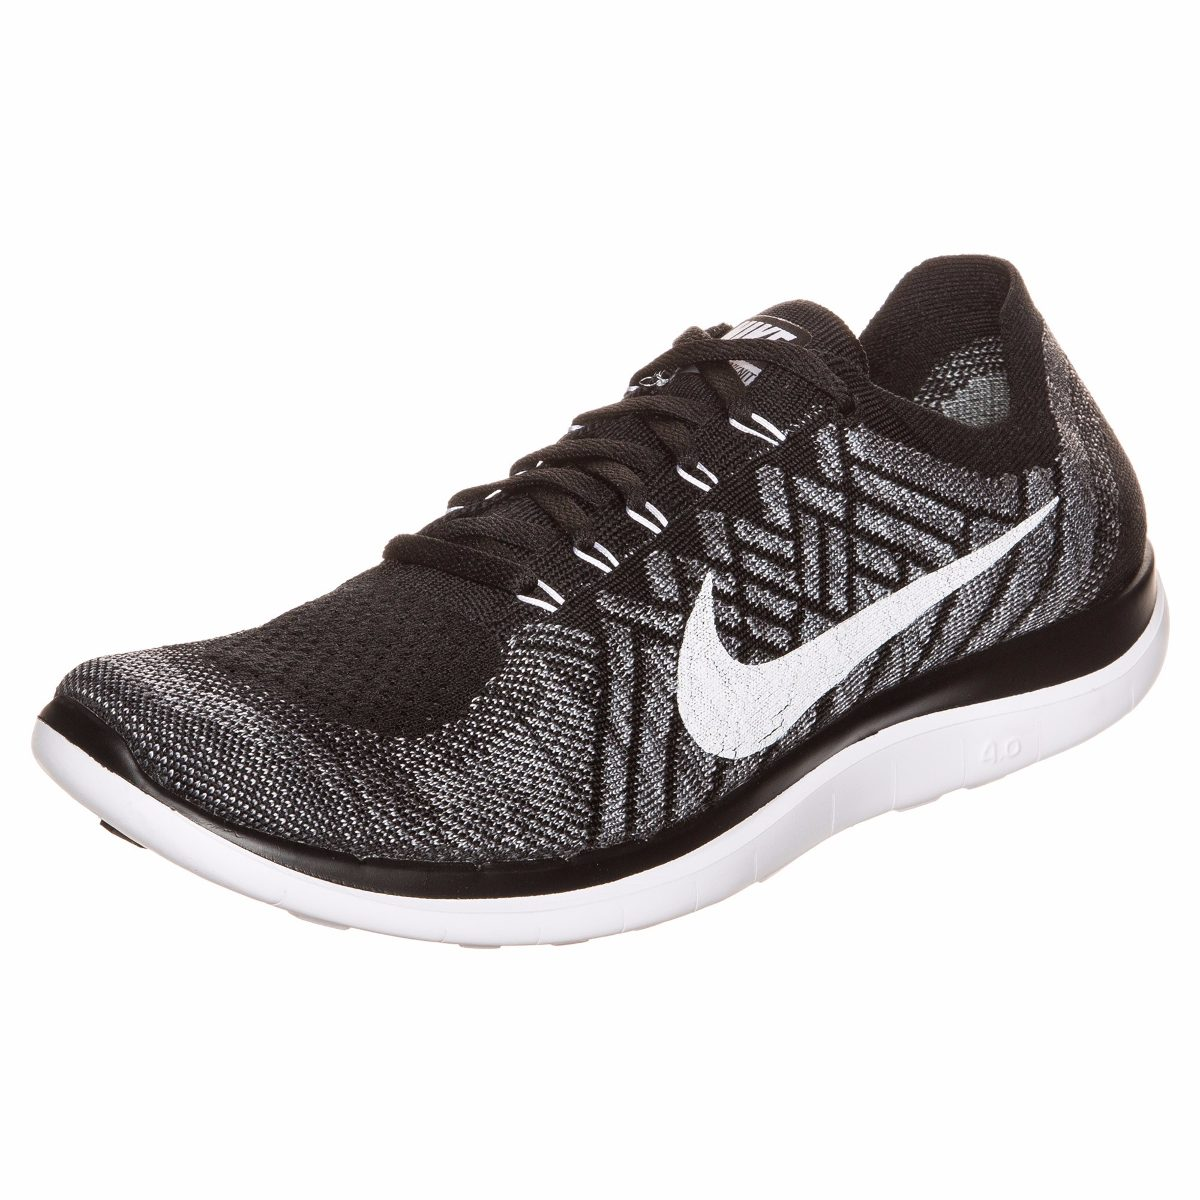 Tenis Nike Free 4.0 Flyknit Running Original Corrida V2mshop